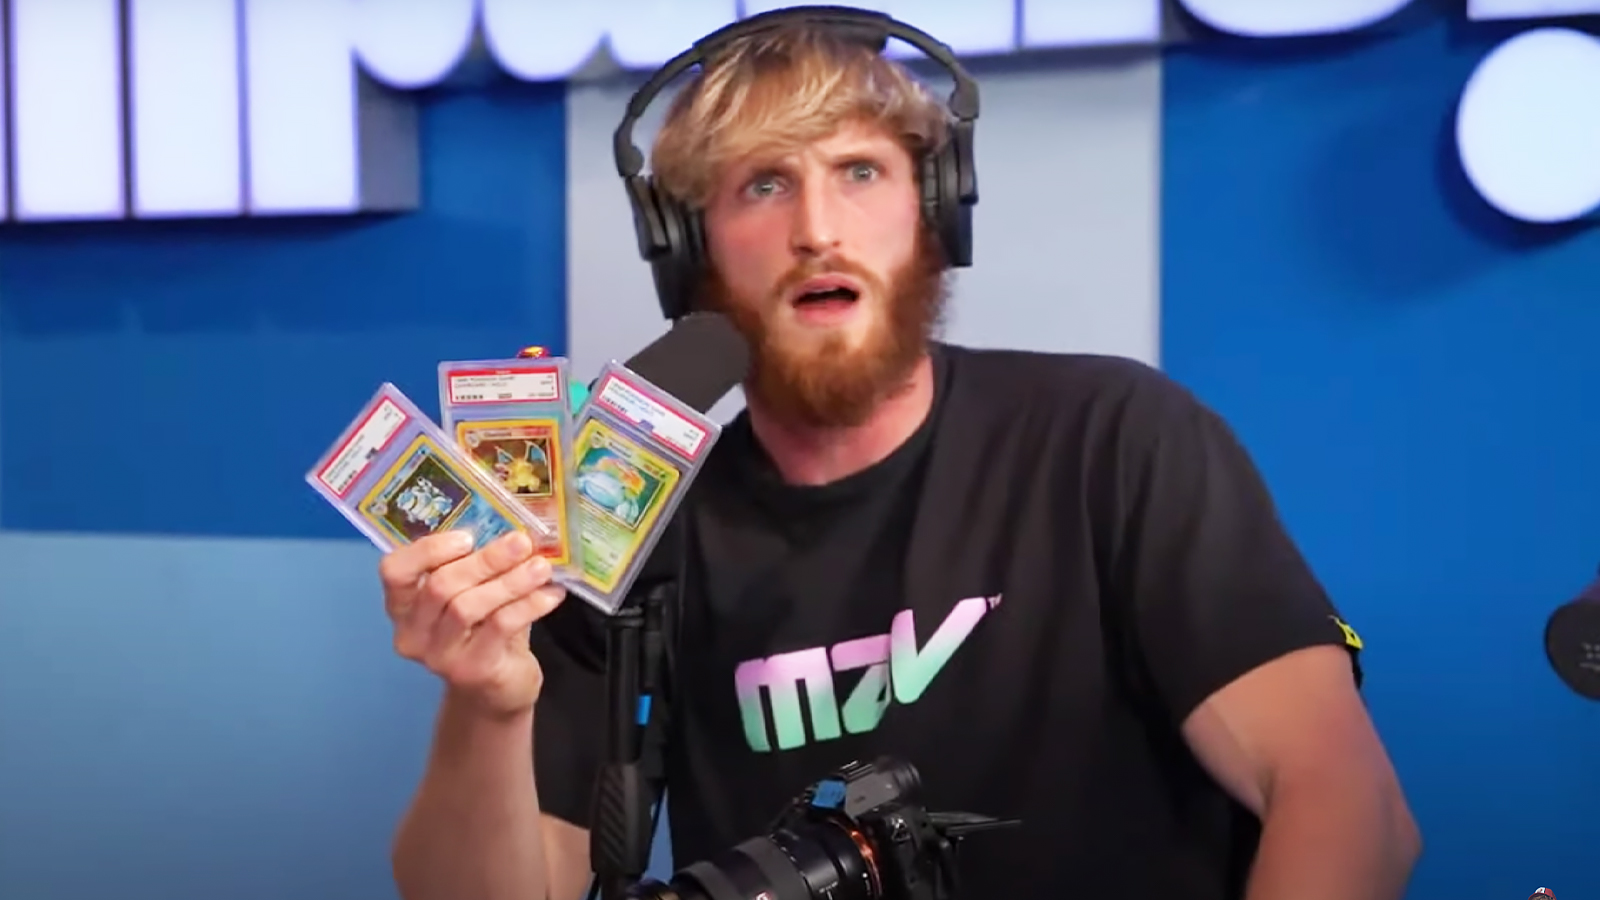 logan paul holding pokemon cards